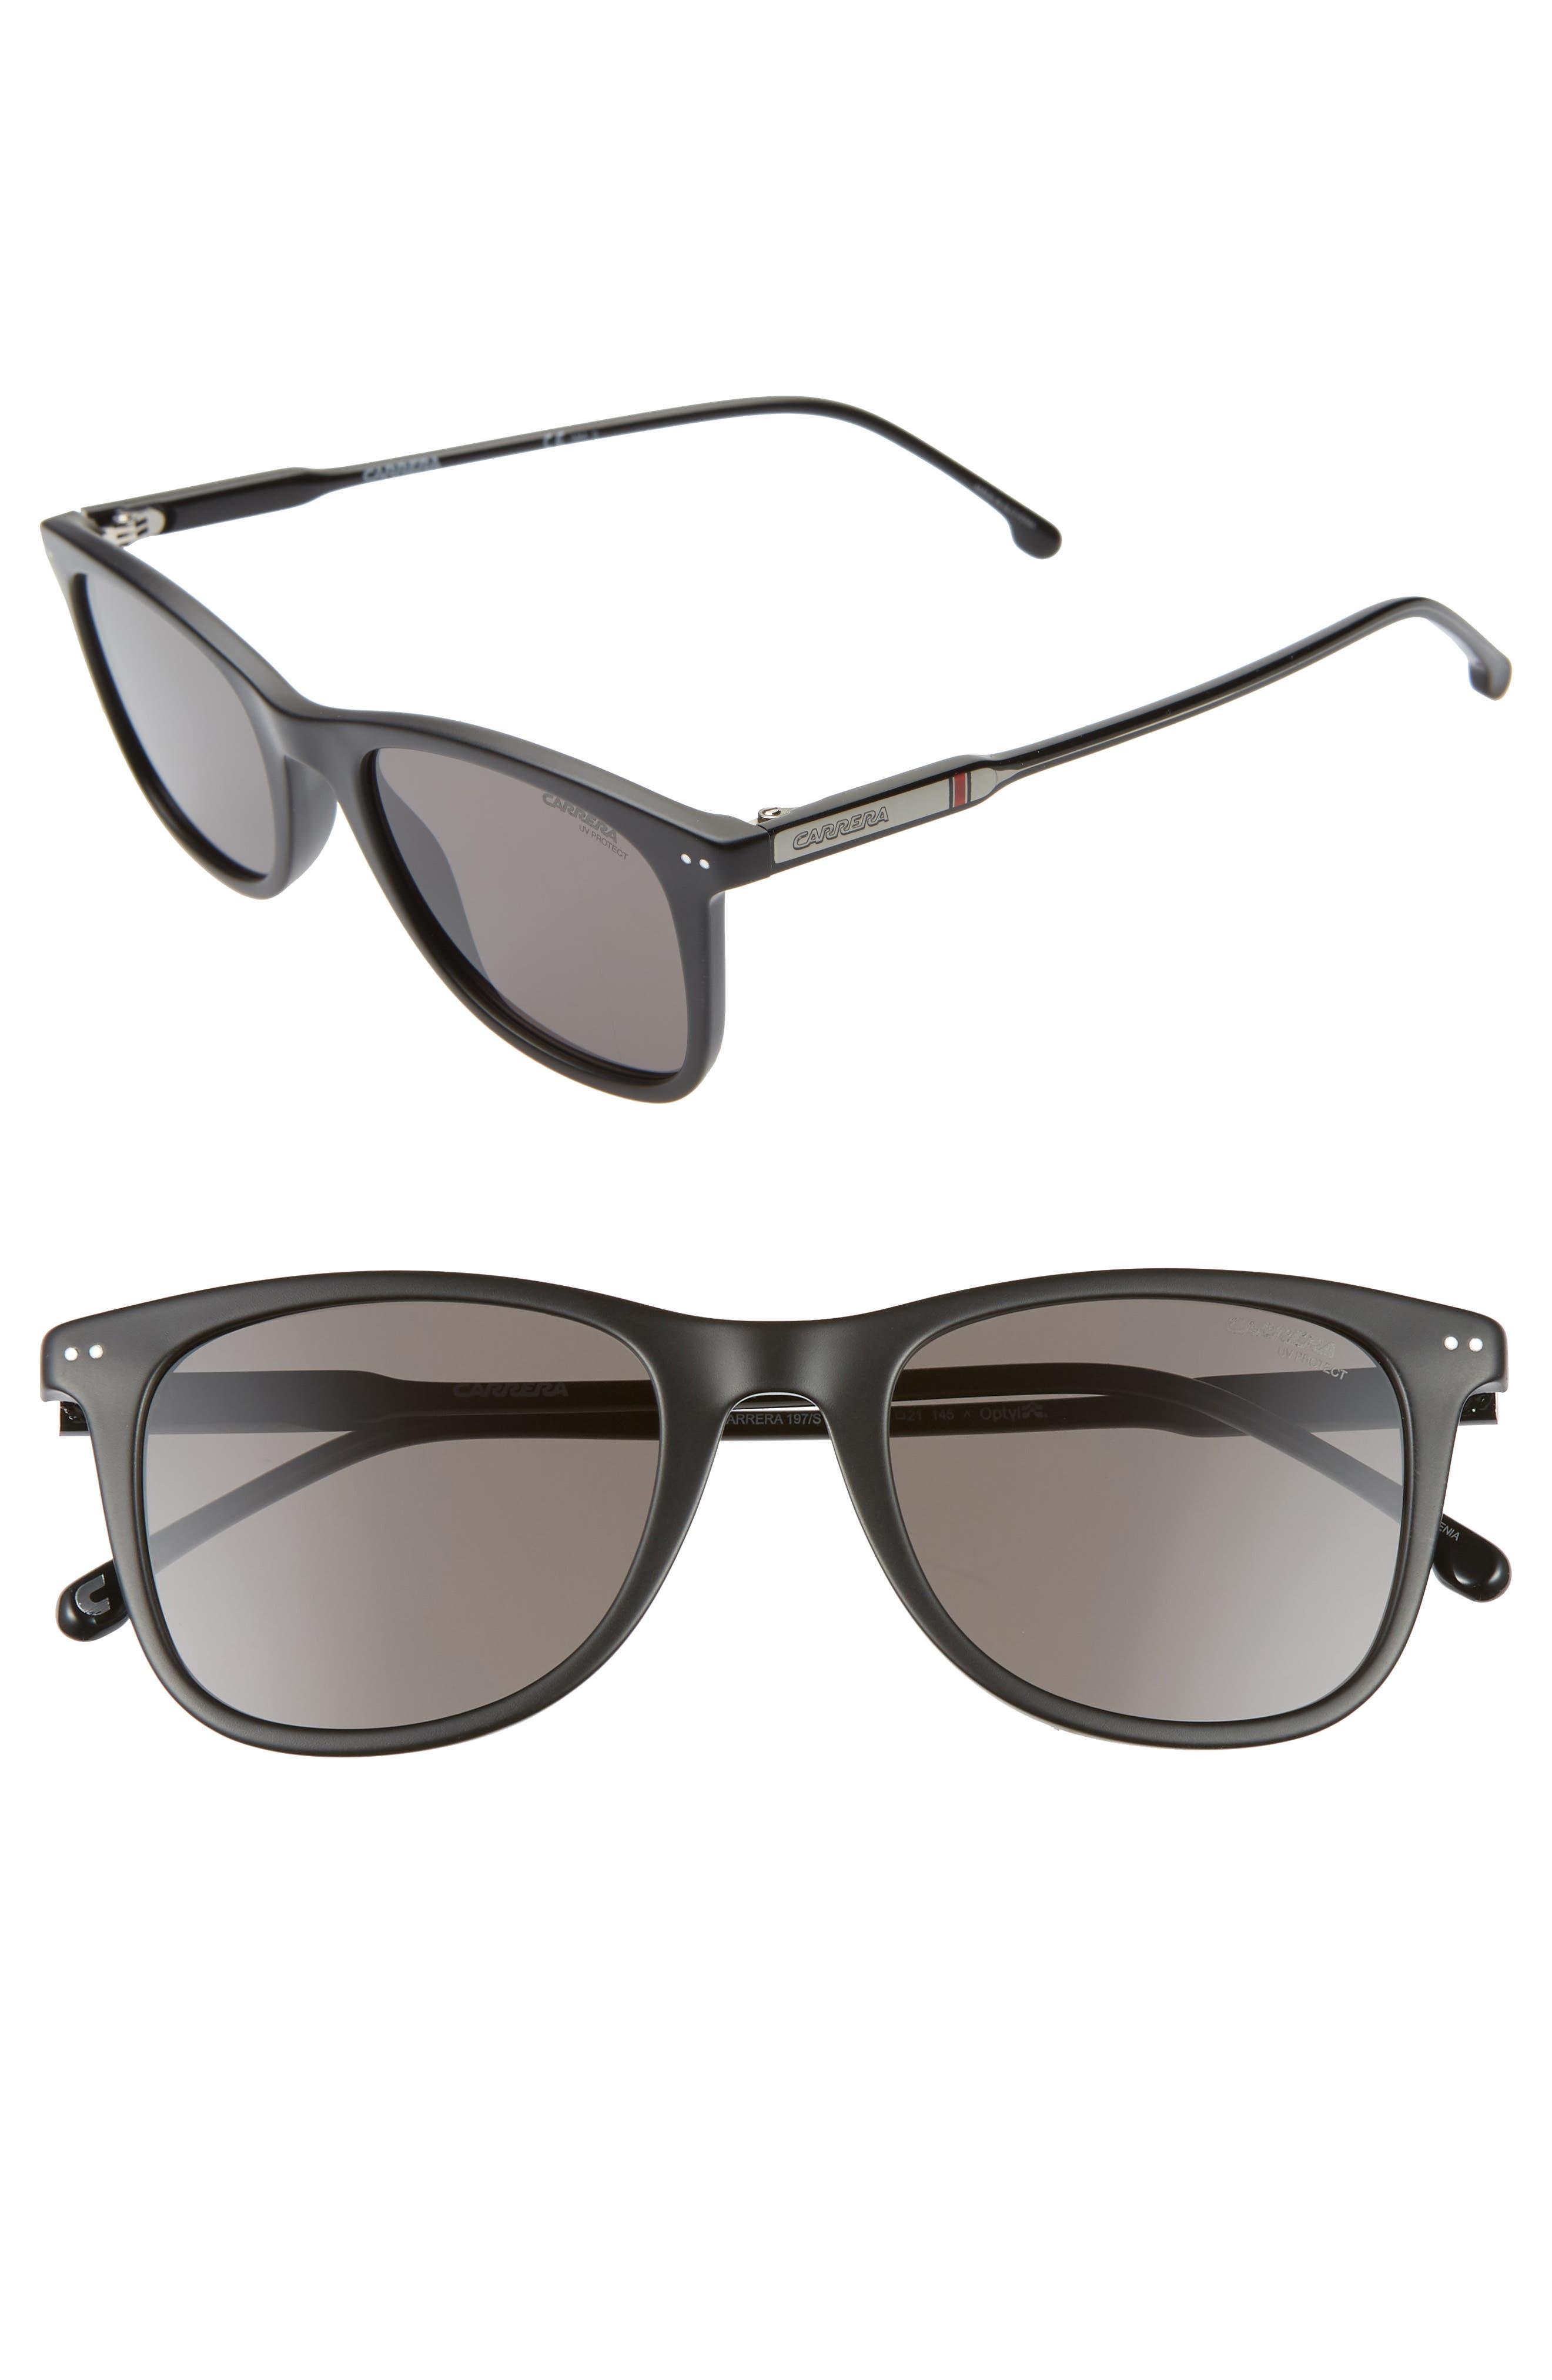 Carrera Eyewear 51Mm Sunglasses - Matte Black